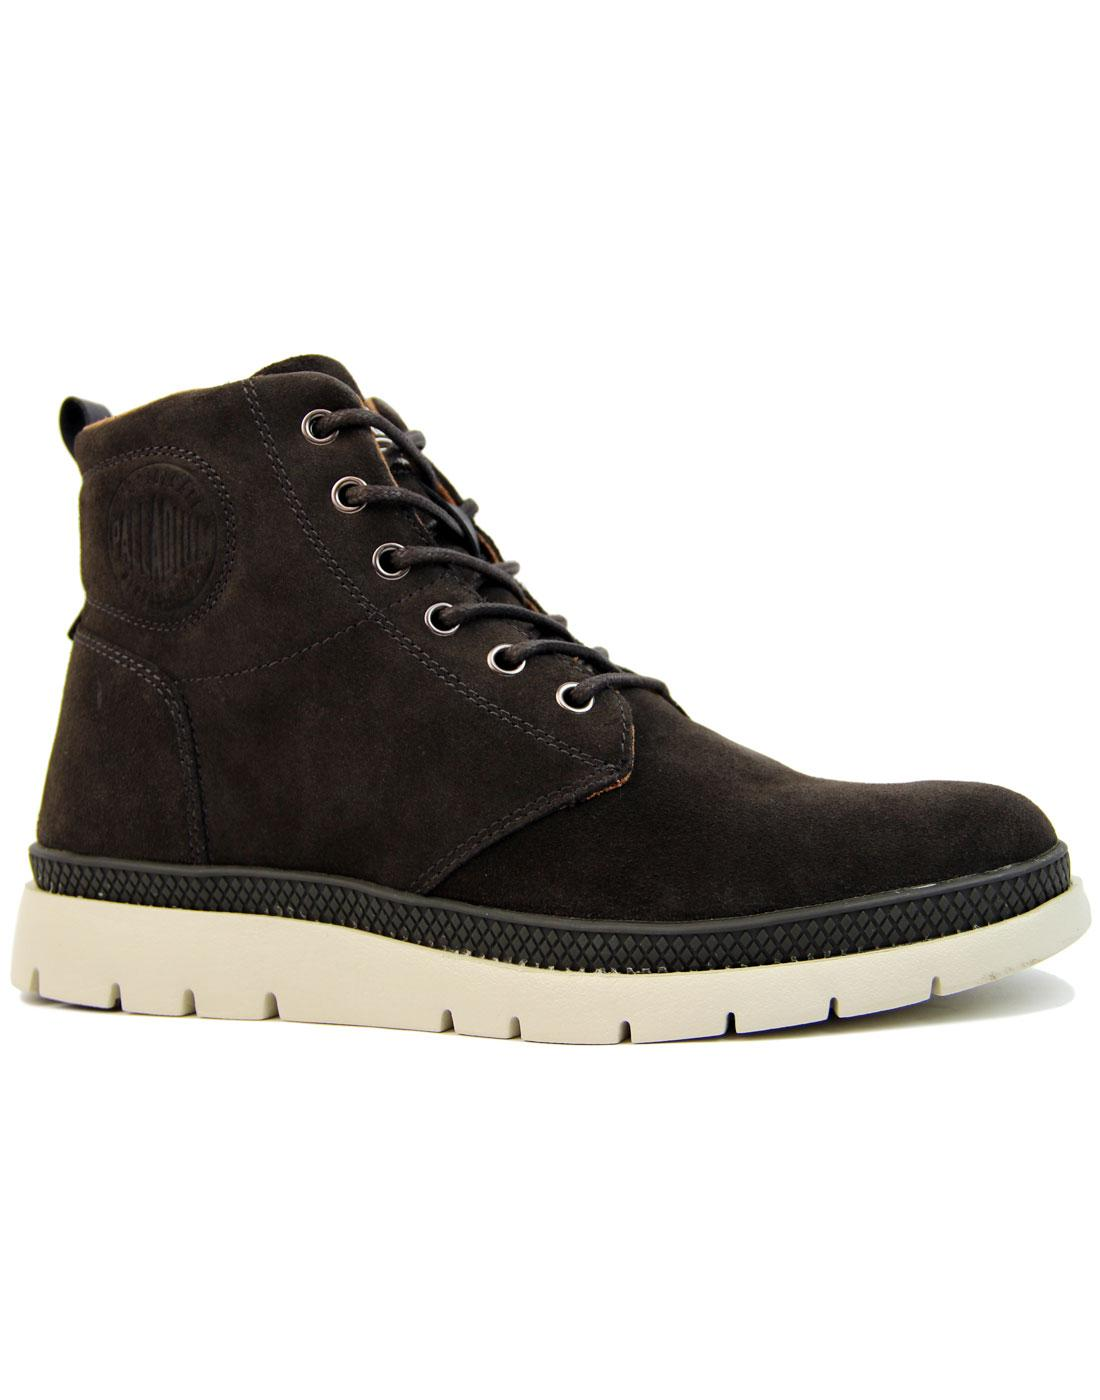 Pallasider PALLADIUM Mid Rise Suede Sneaker Boots